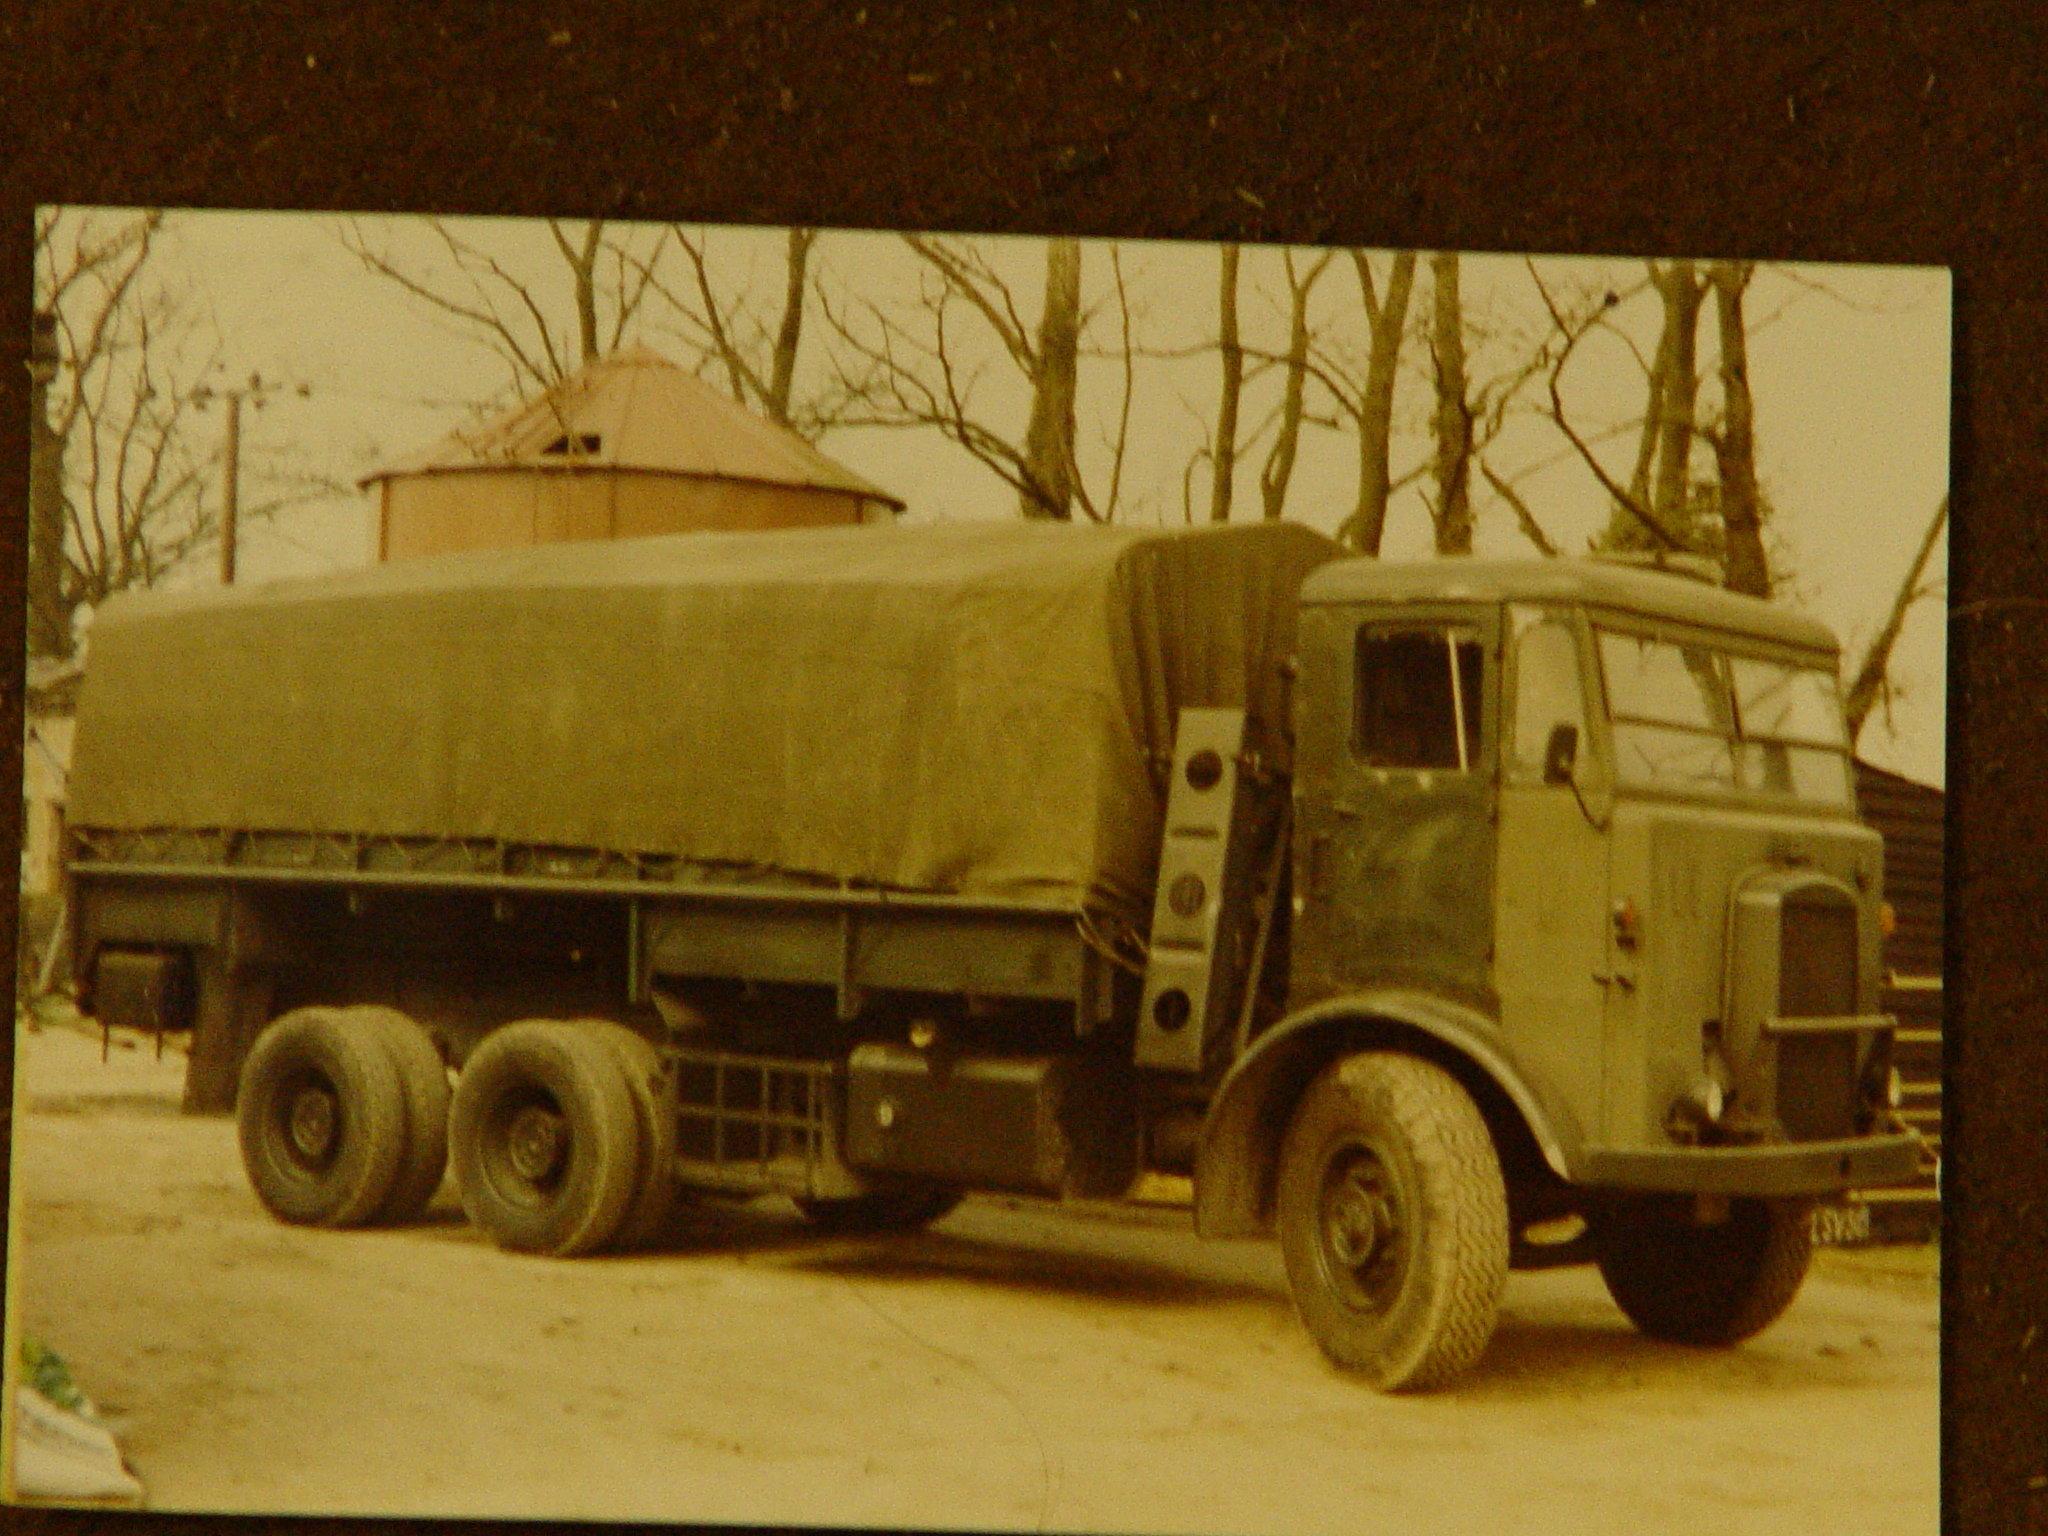 1939 Leyland Hippo - HMVF Classifieds - HMVF - Historic